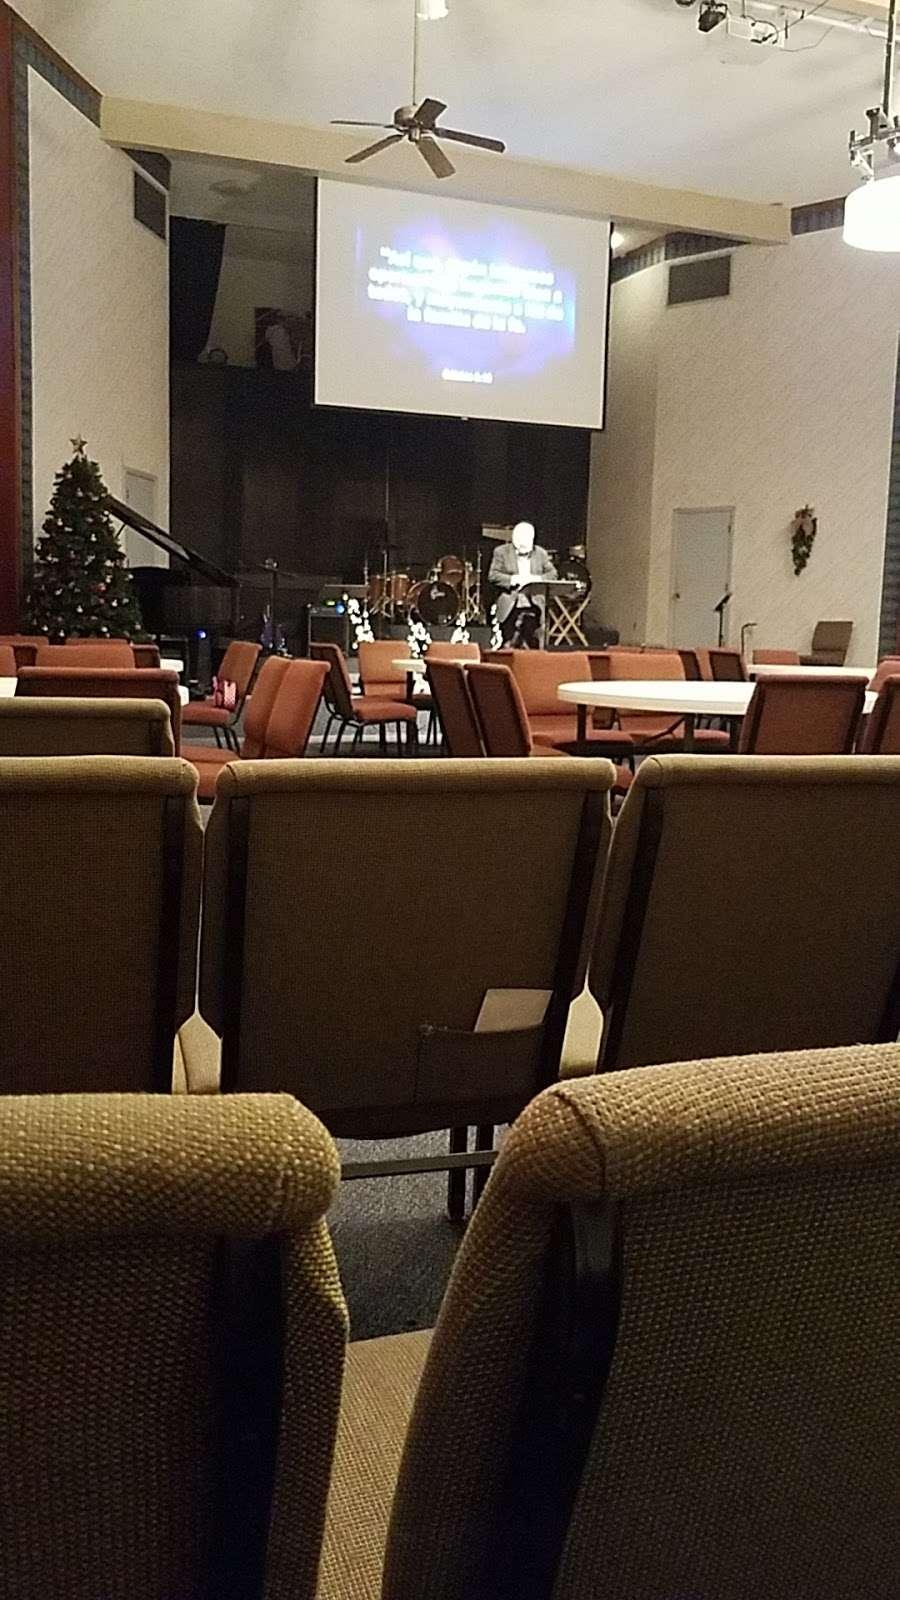 Mt Pleasant Christian Center - church  | Photo 6 of 10 | Address: 3535 Clayton Rd, San Jose, CA 95127, USA | Phone: (408) 258-1822